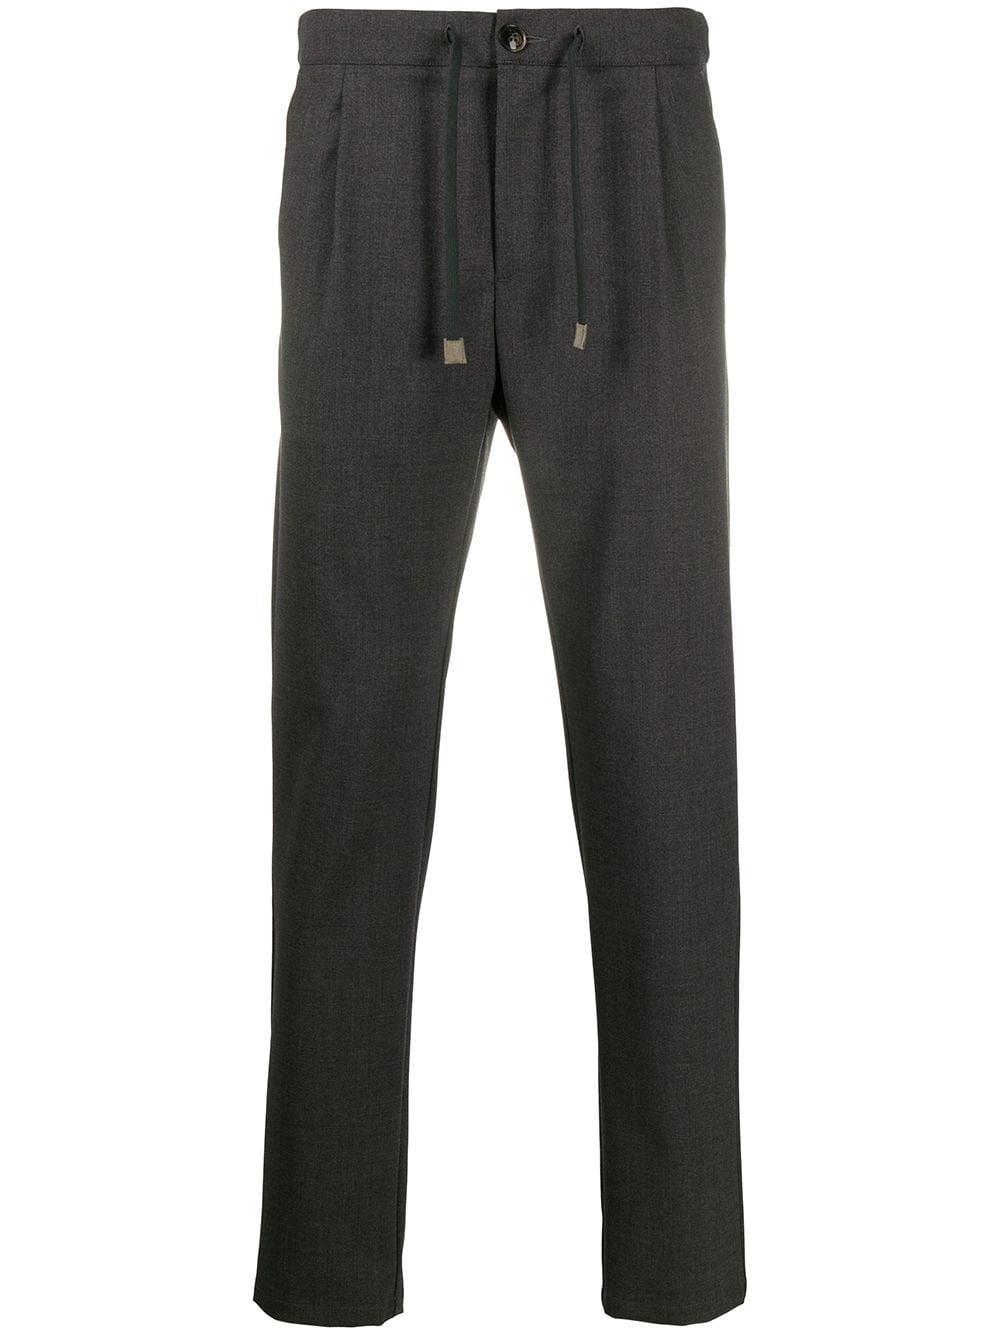 Pantaloni sartoriali grigi in misto lana con coulisse ELEVENTY | Pantaloni | B70PANB01-TES0B10414